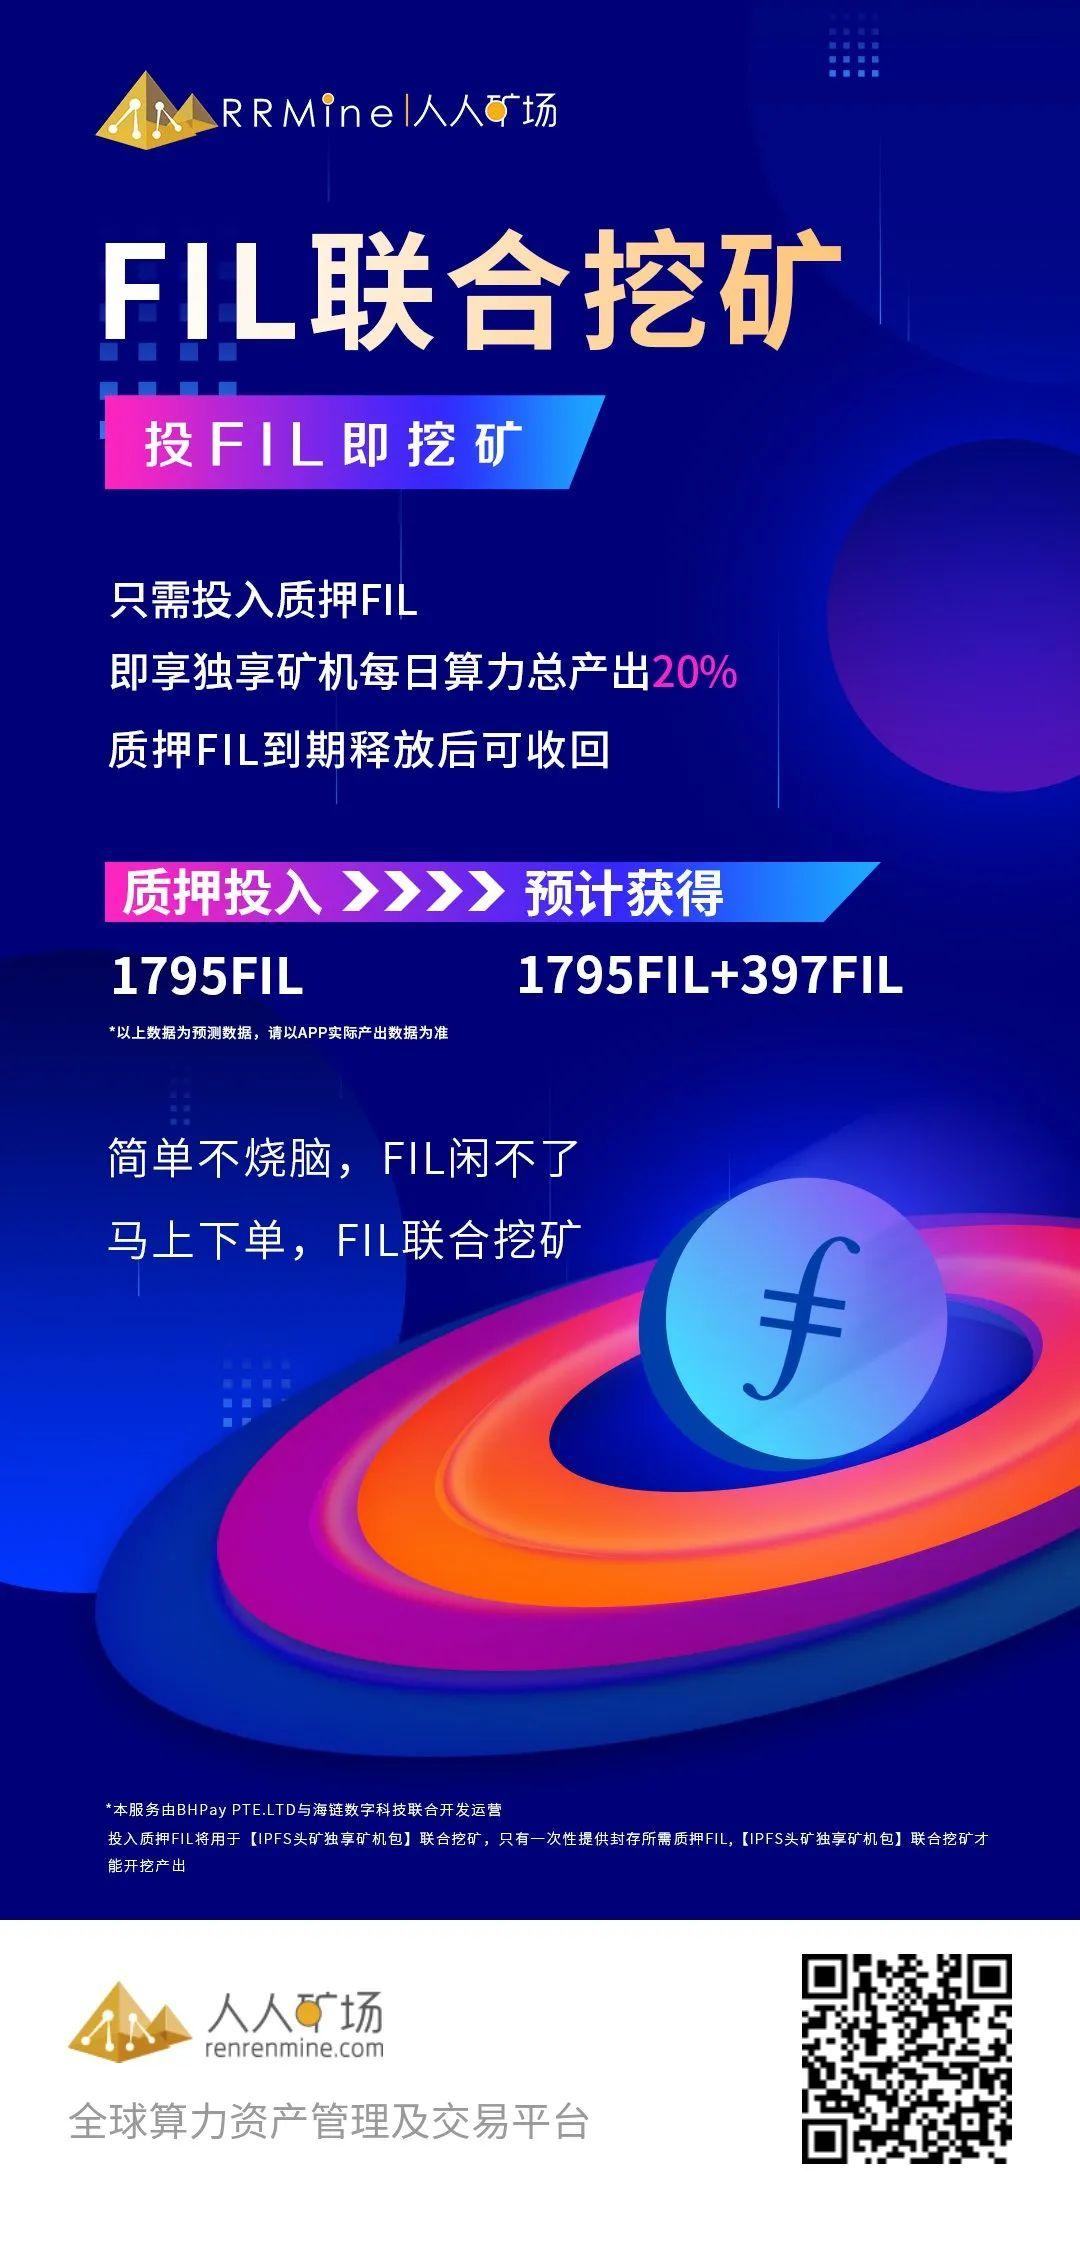 Filecoin官方信息 Filecoin在国债、遗嘱、金融管理等领域的应用